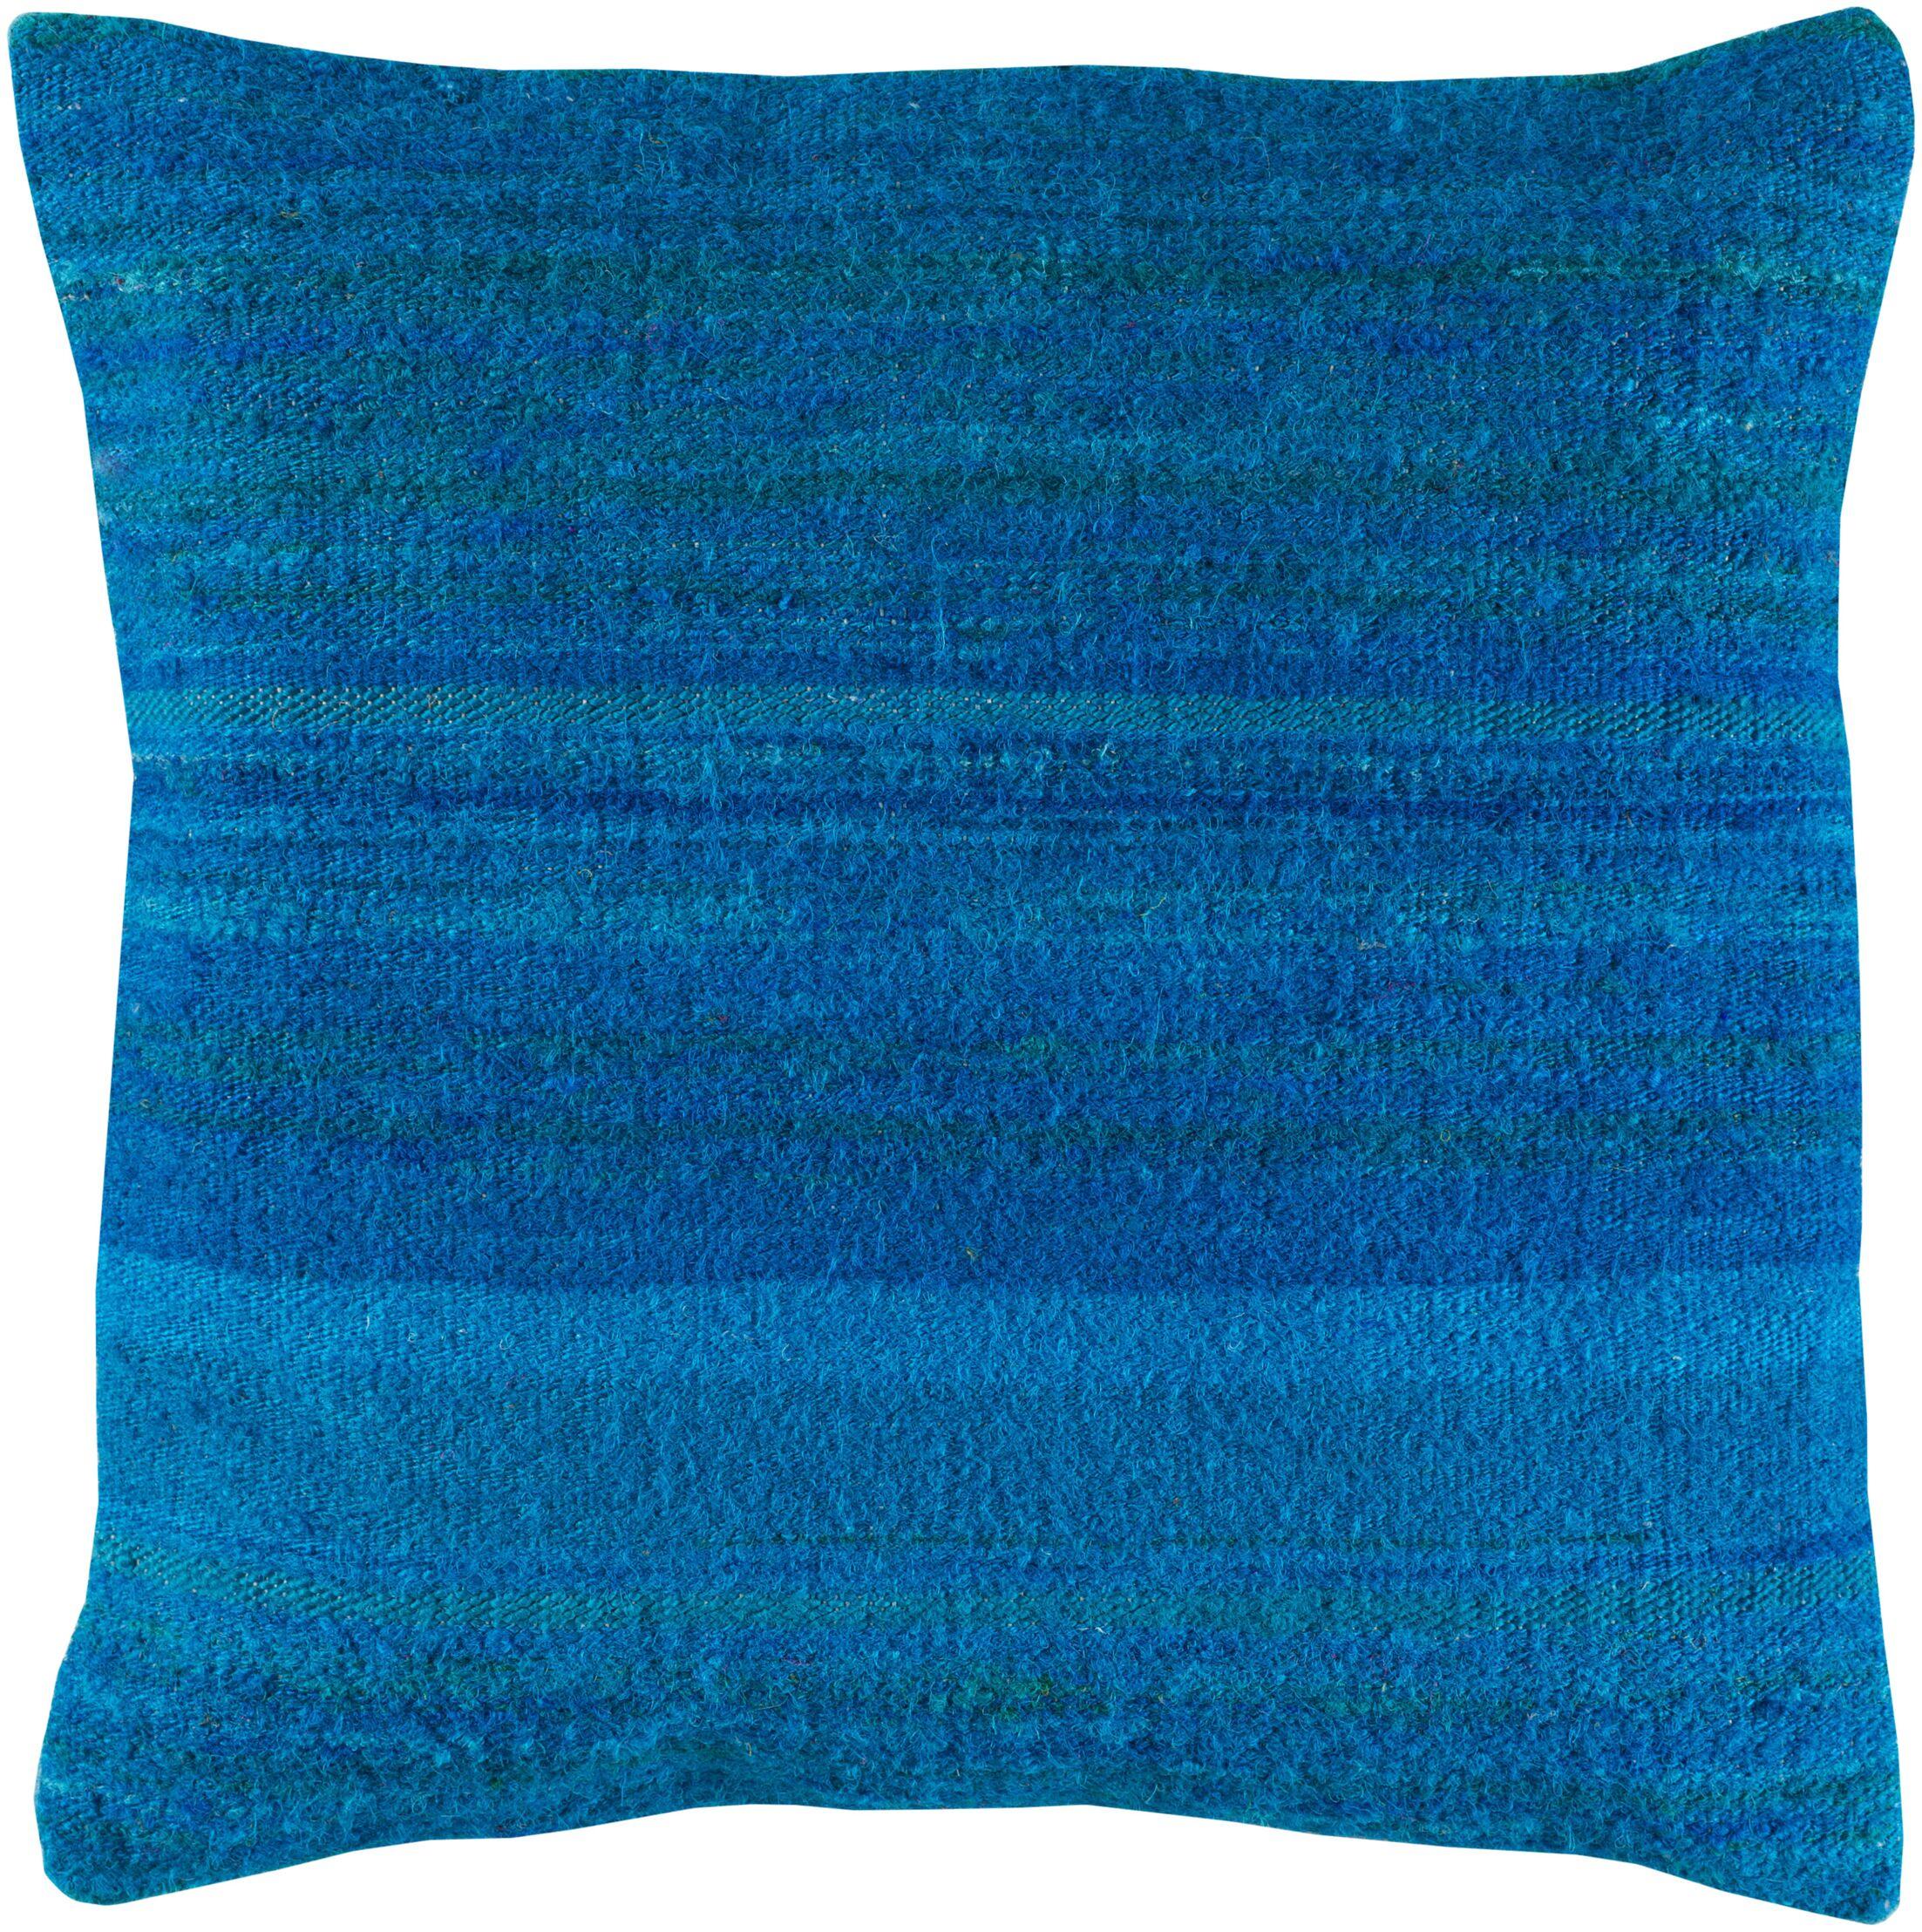 Jabari Throw Pillow Fill Material: Down Fill, Color: Sky Blue